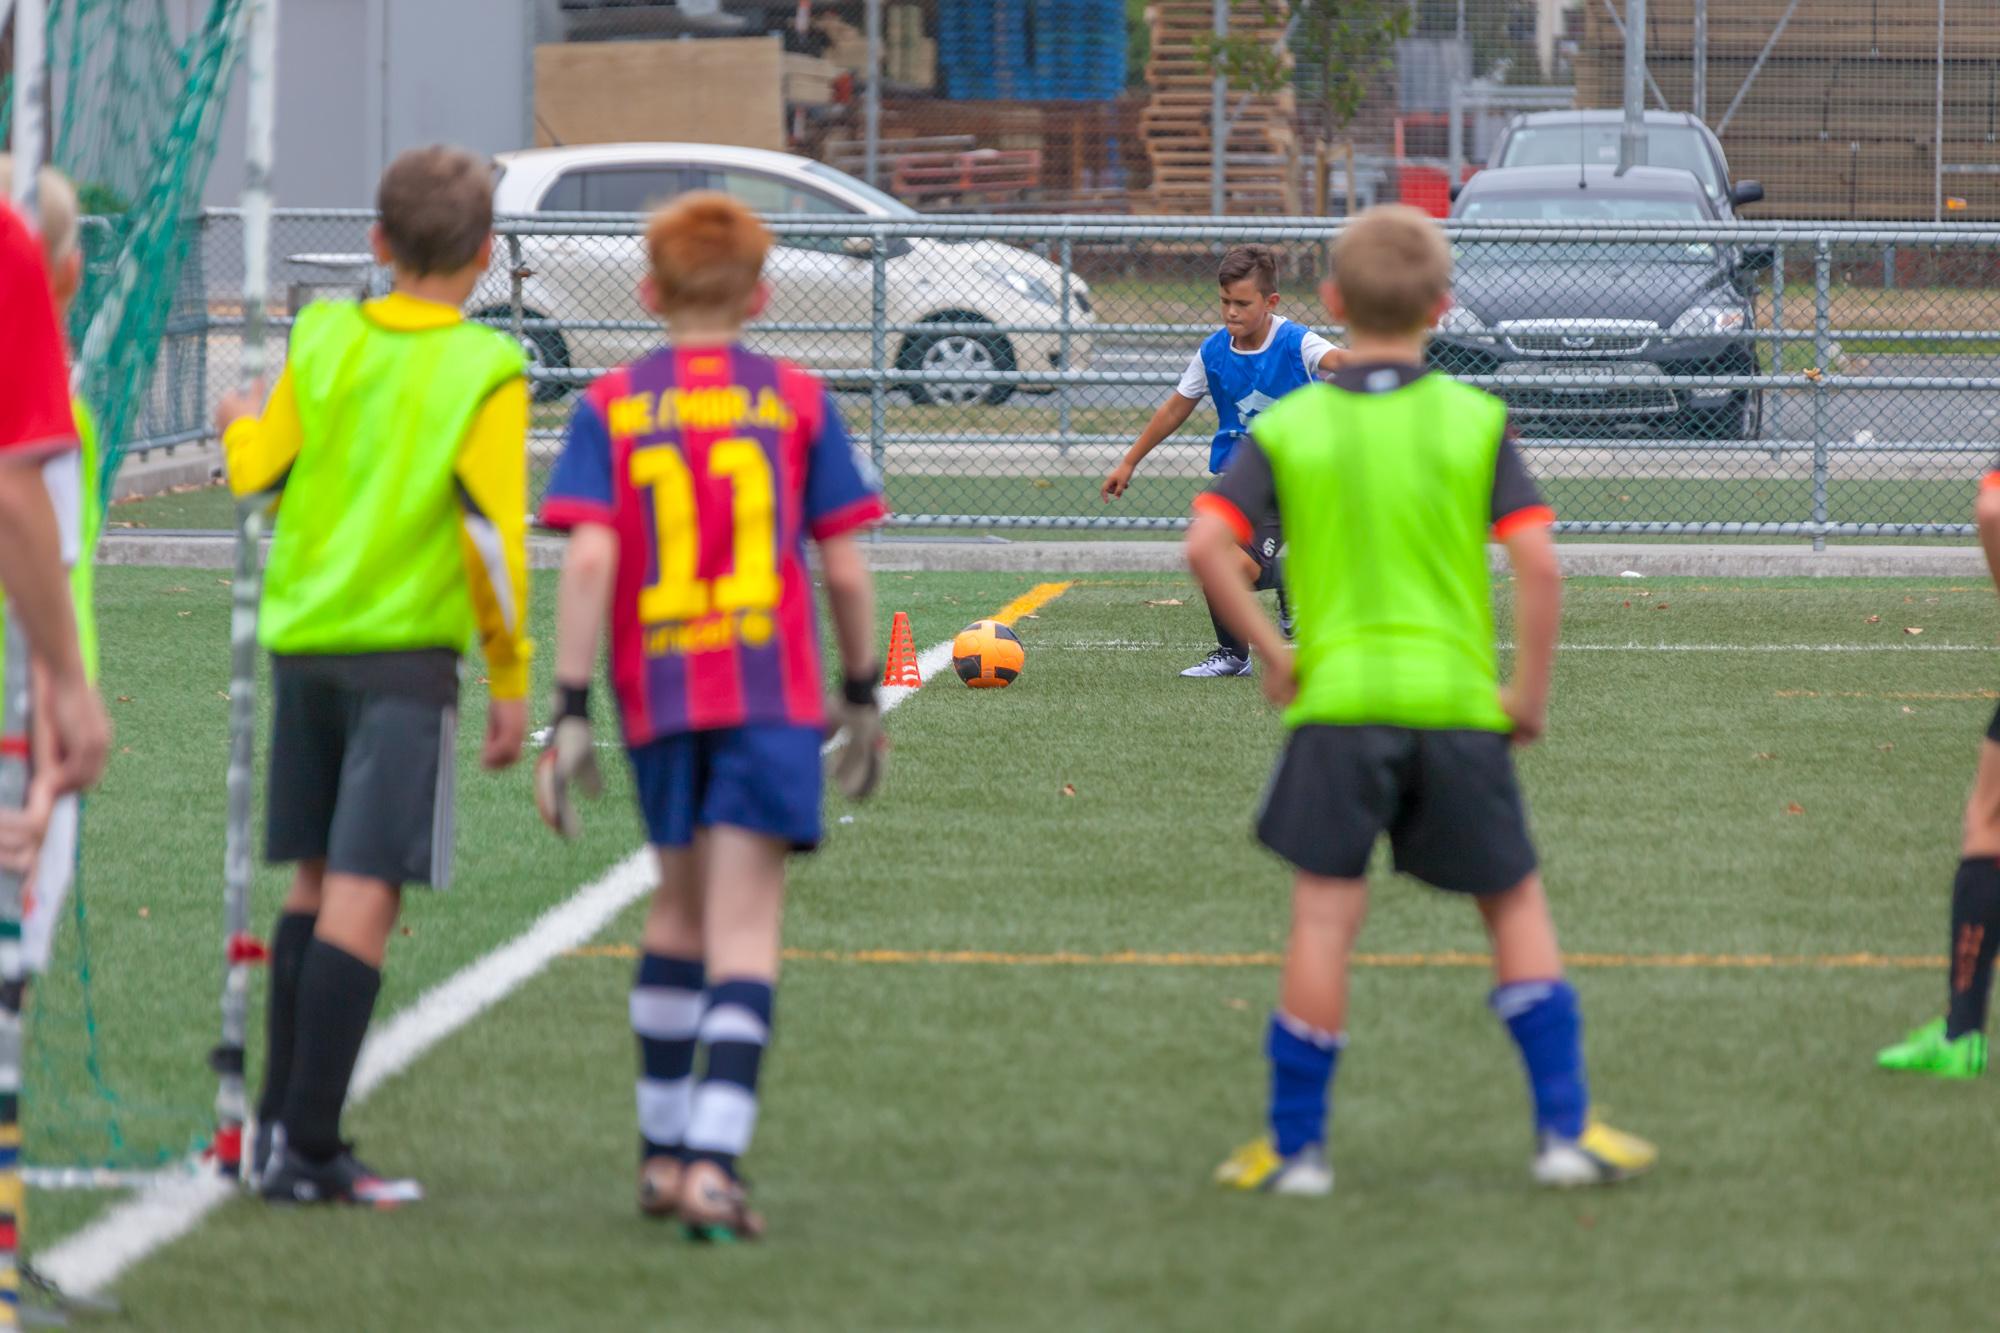 UHCC Soccer Coach 4517